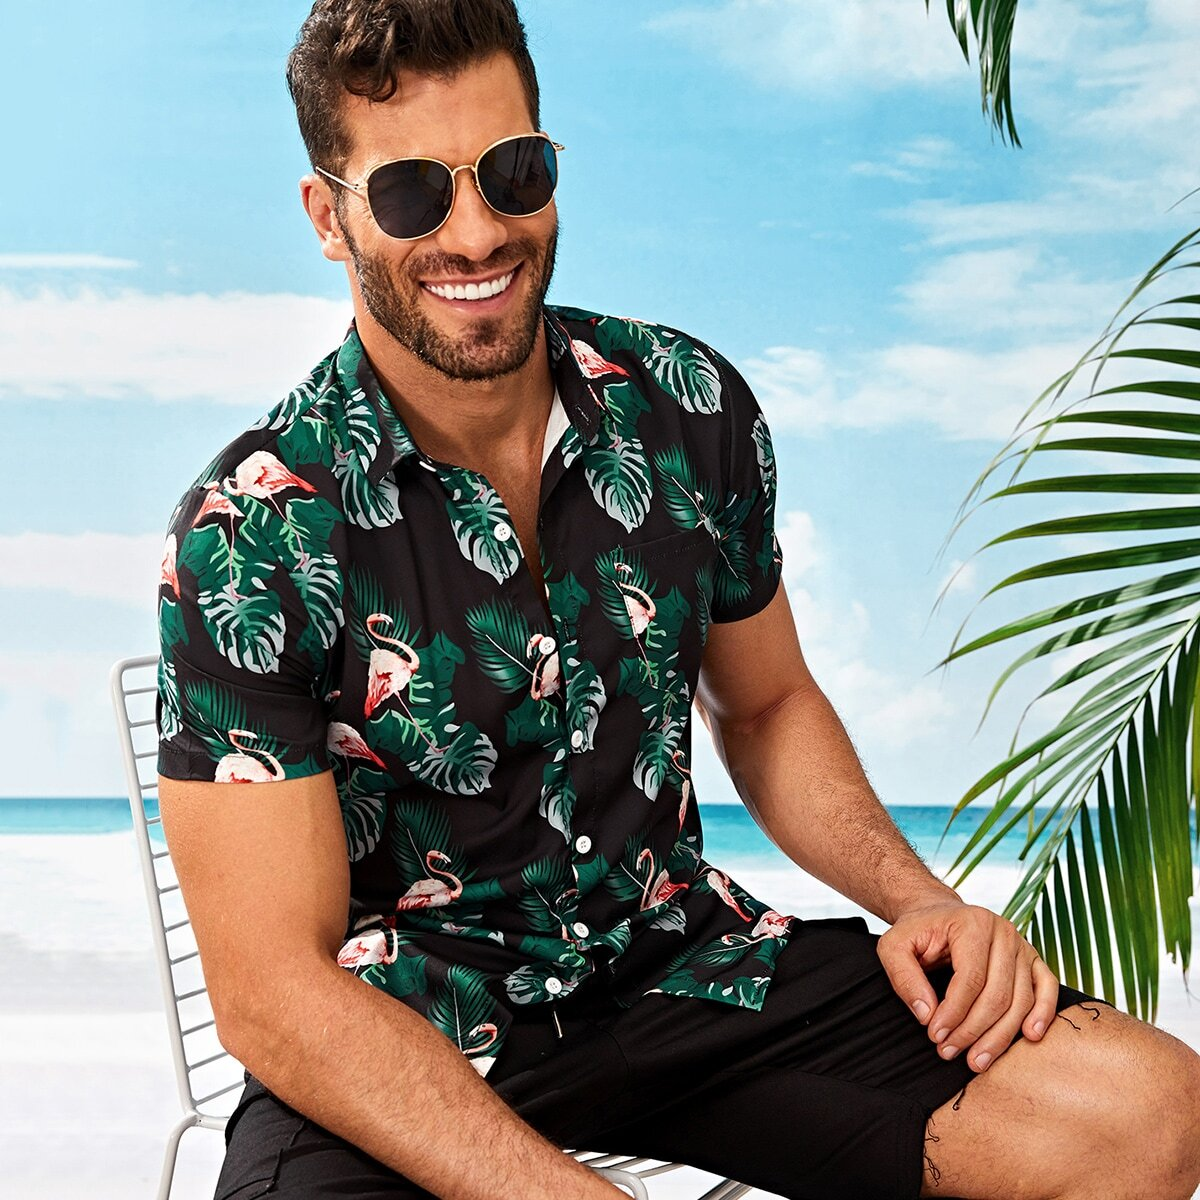 SHEIN coupon: Men Tropical & Flamingo Print Shirt